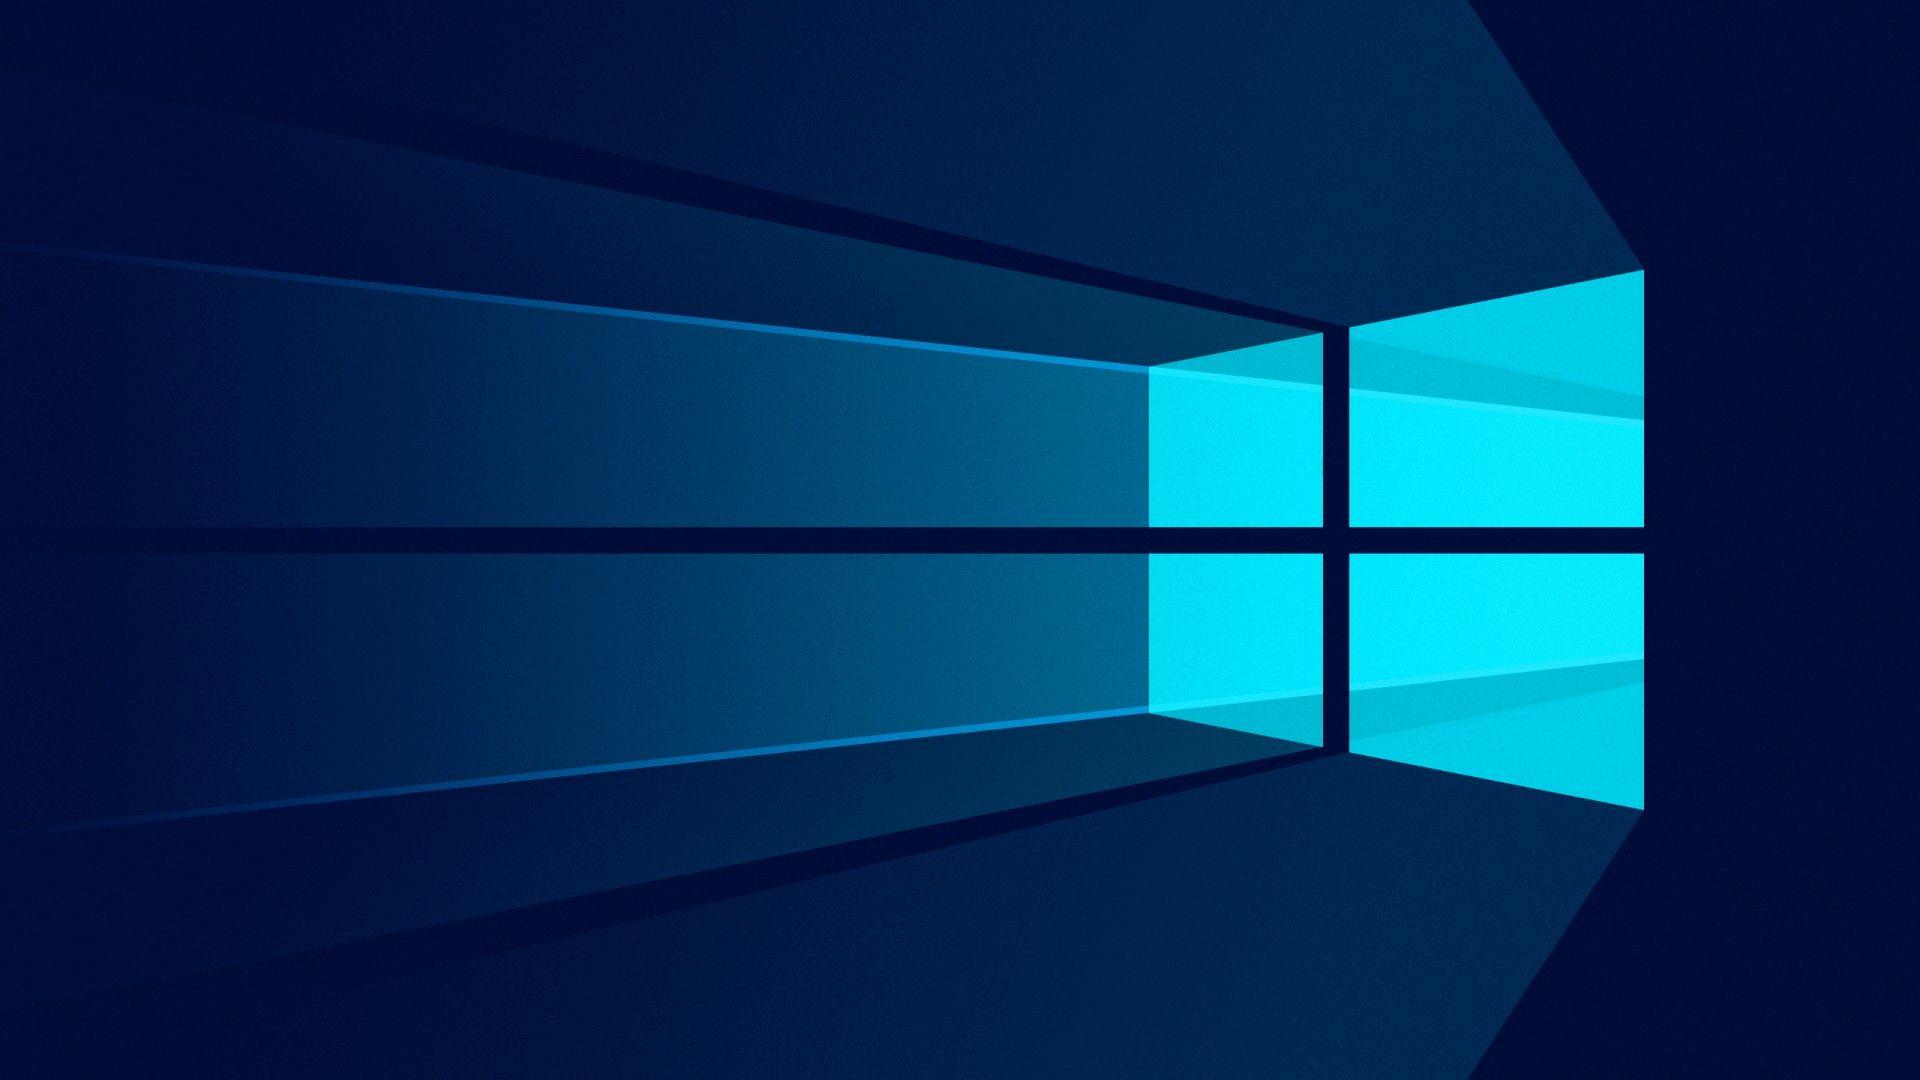 1920x1080 Better Windows 10 Renkler Duvar Duvar Kagitlari